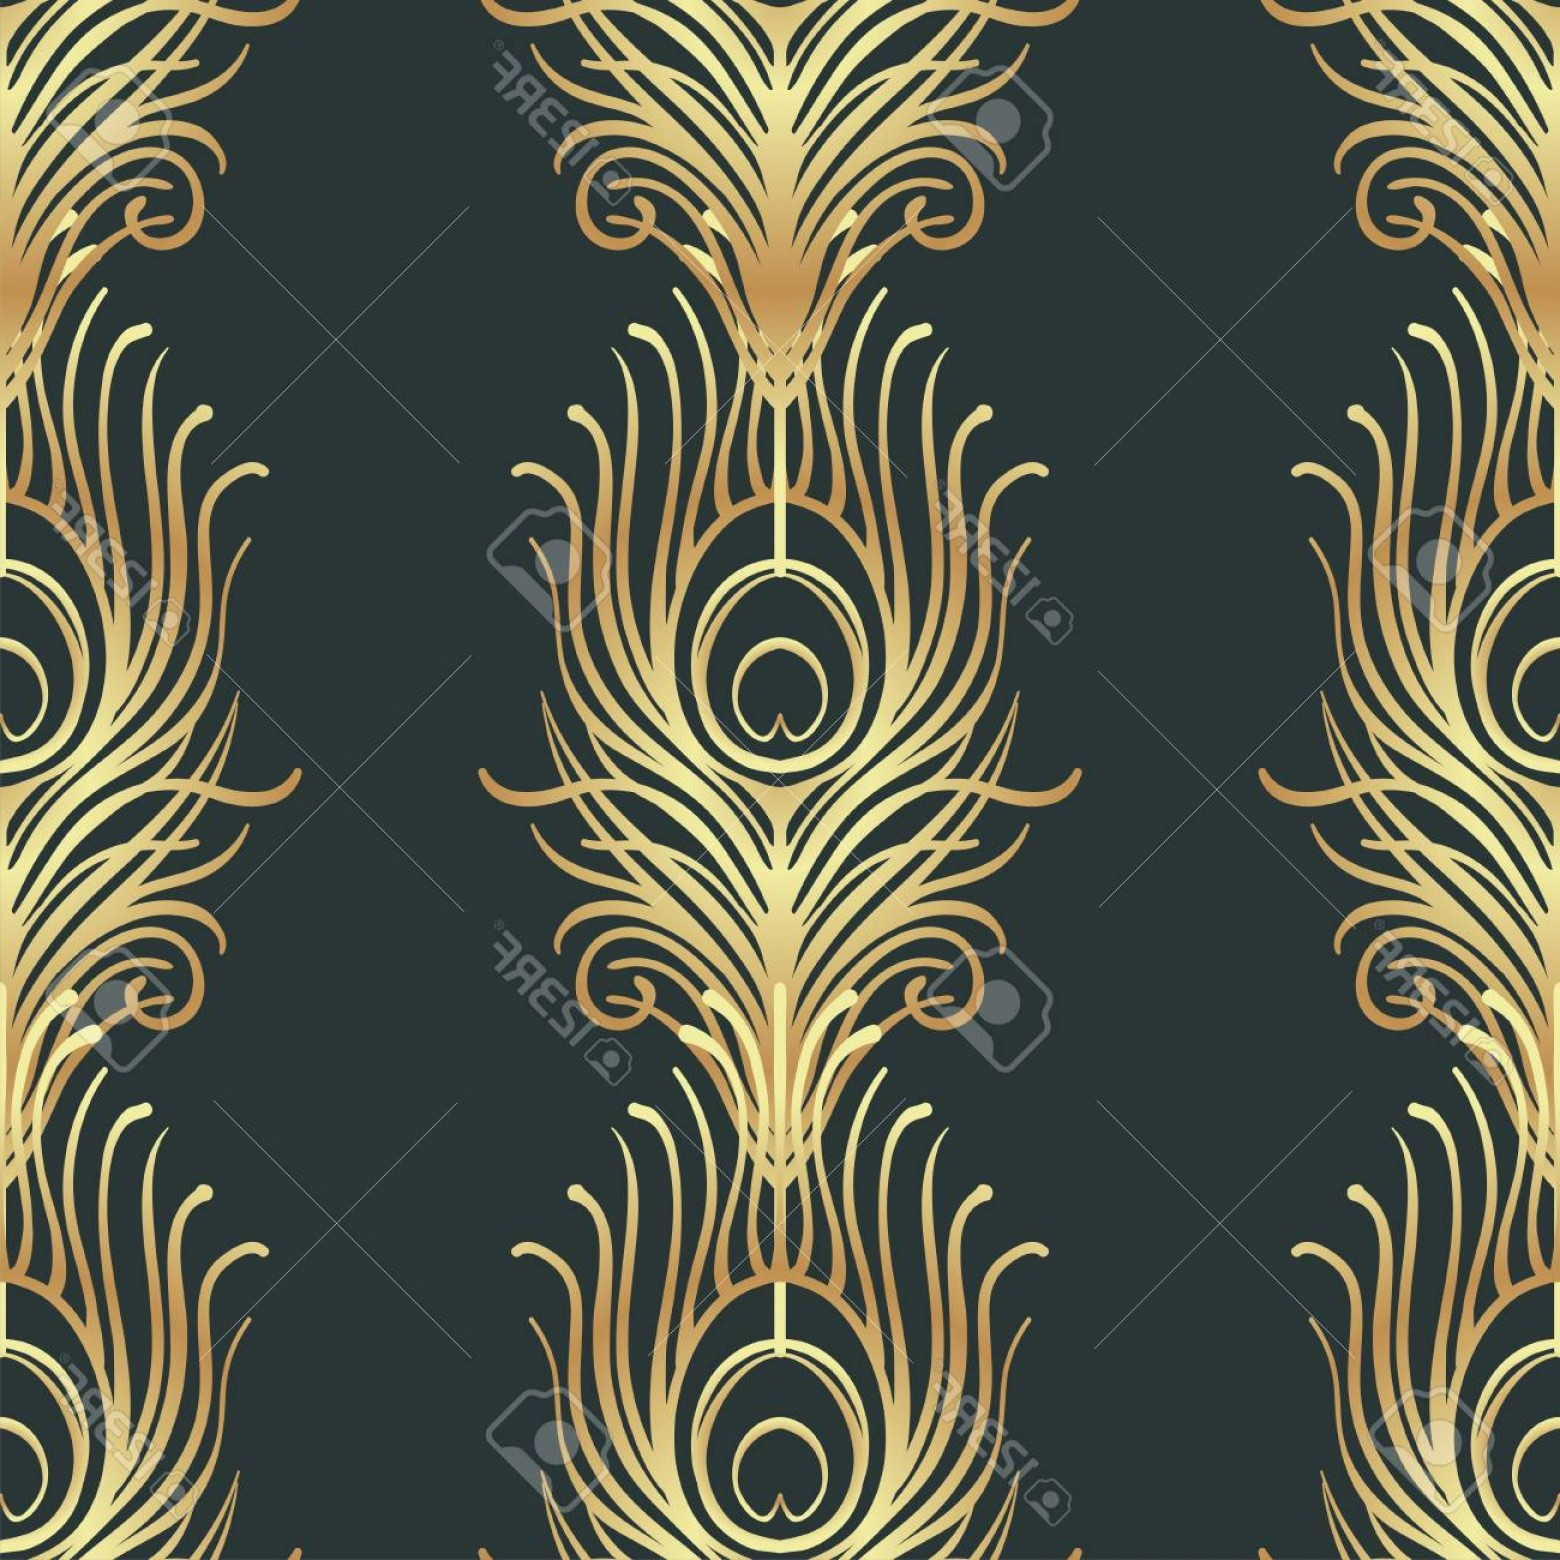 1560x1560 Vintage Gold Vector Designs Shopatcloth